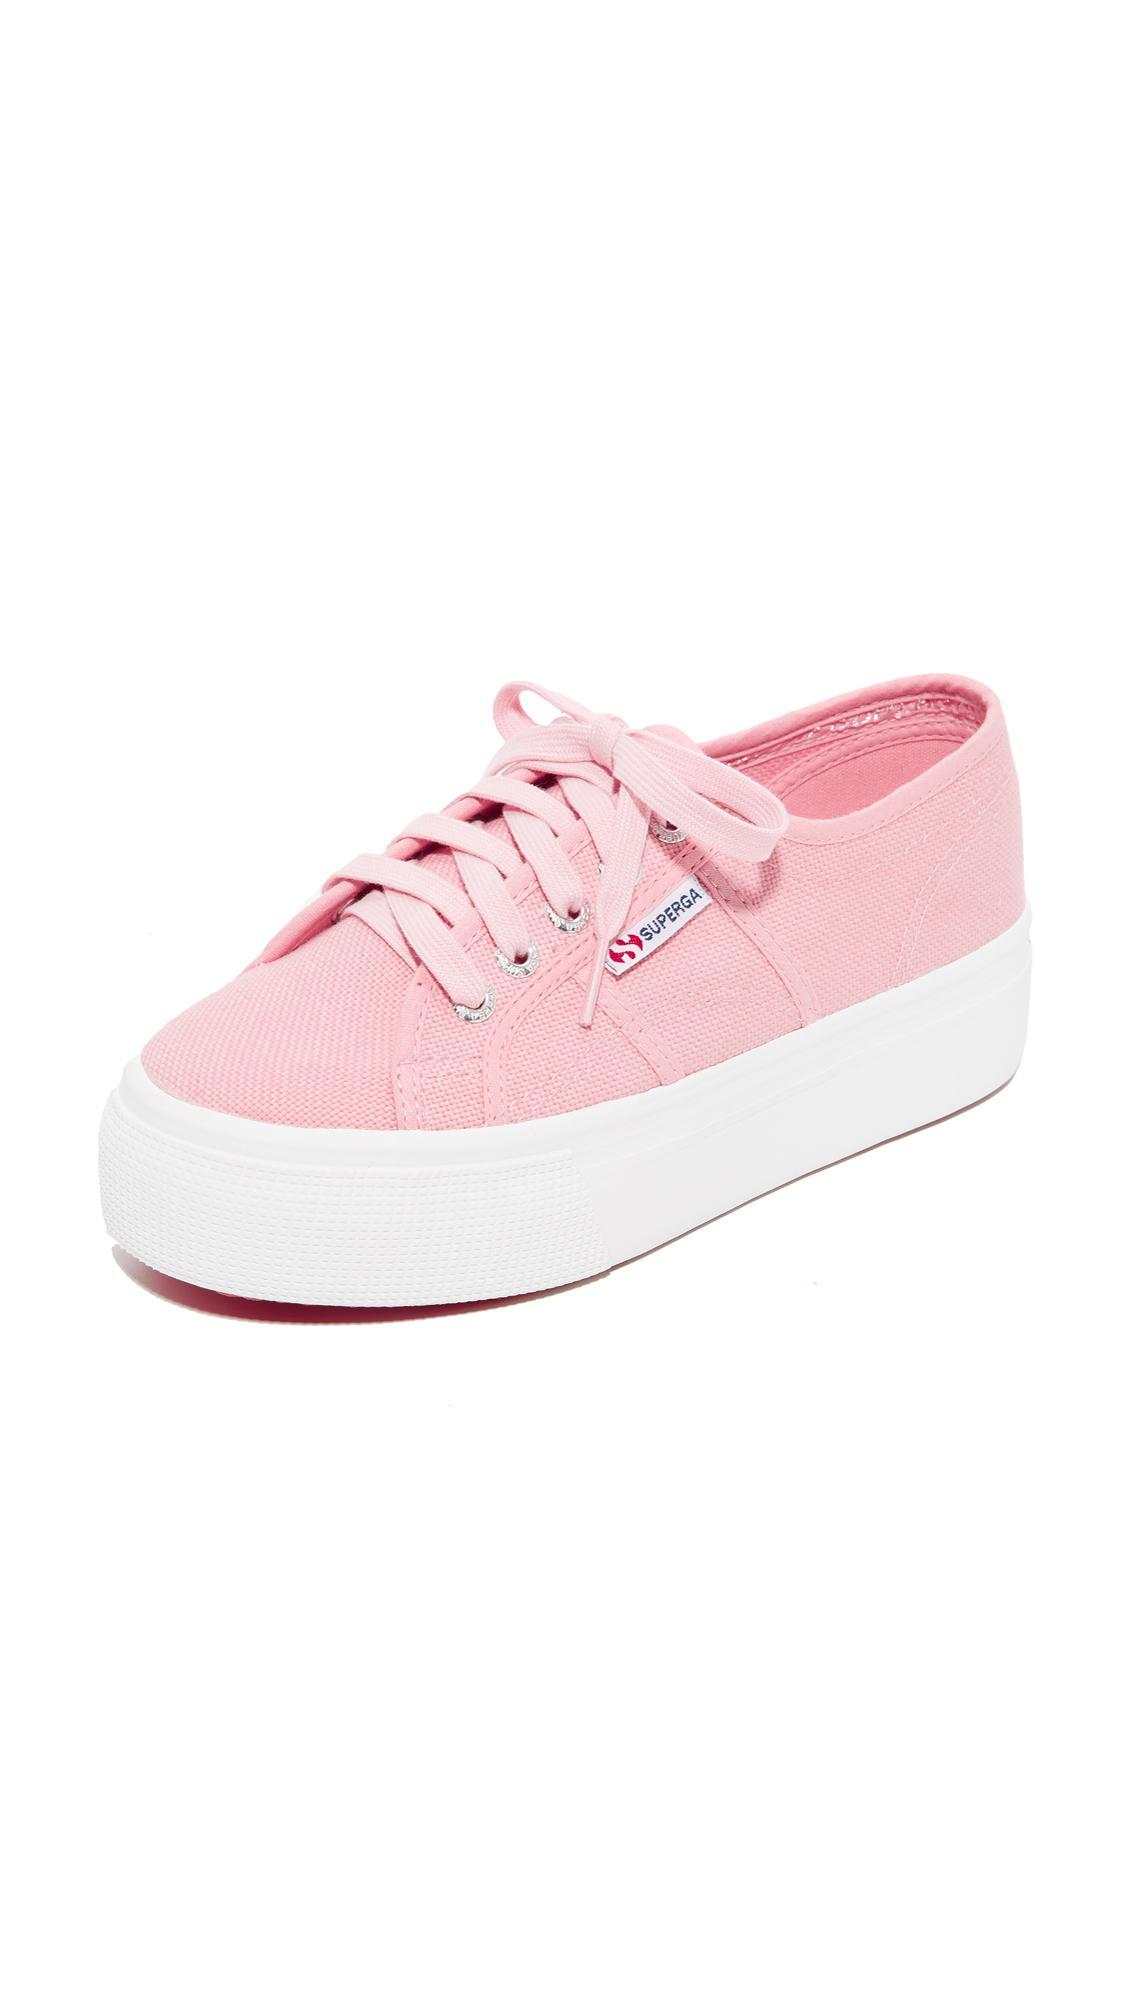 2d363a9387f1 Superga - Pink 2790 Platform Sneakers - Lyst. View fullscreen